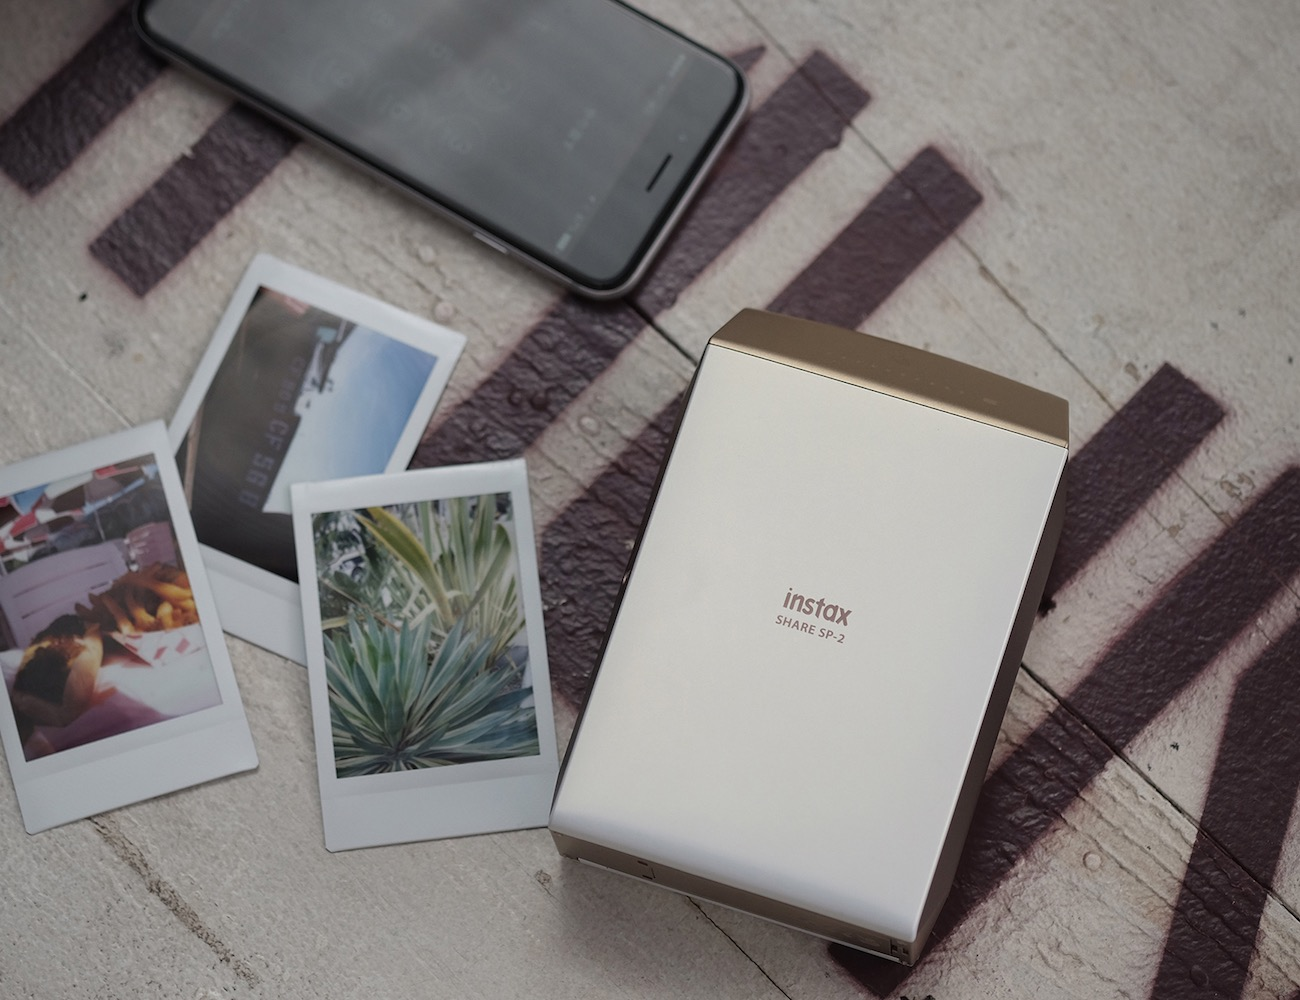 Fujifilm INSTAX SHARE SP-2 Instant Film Photo Printer